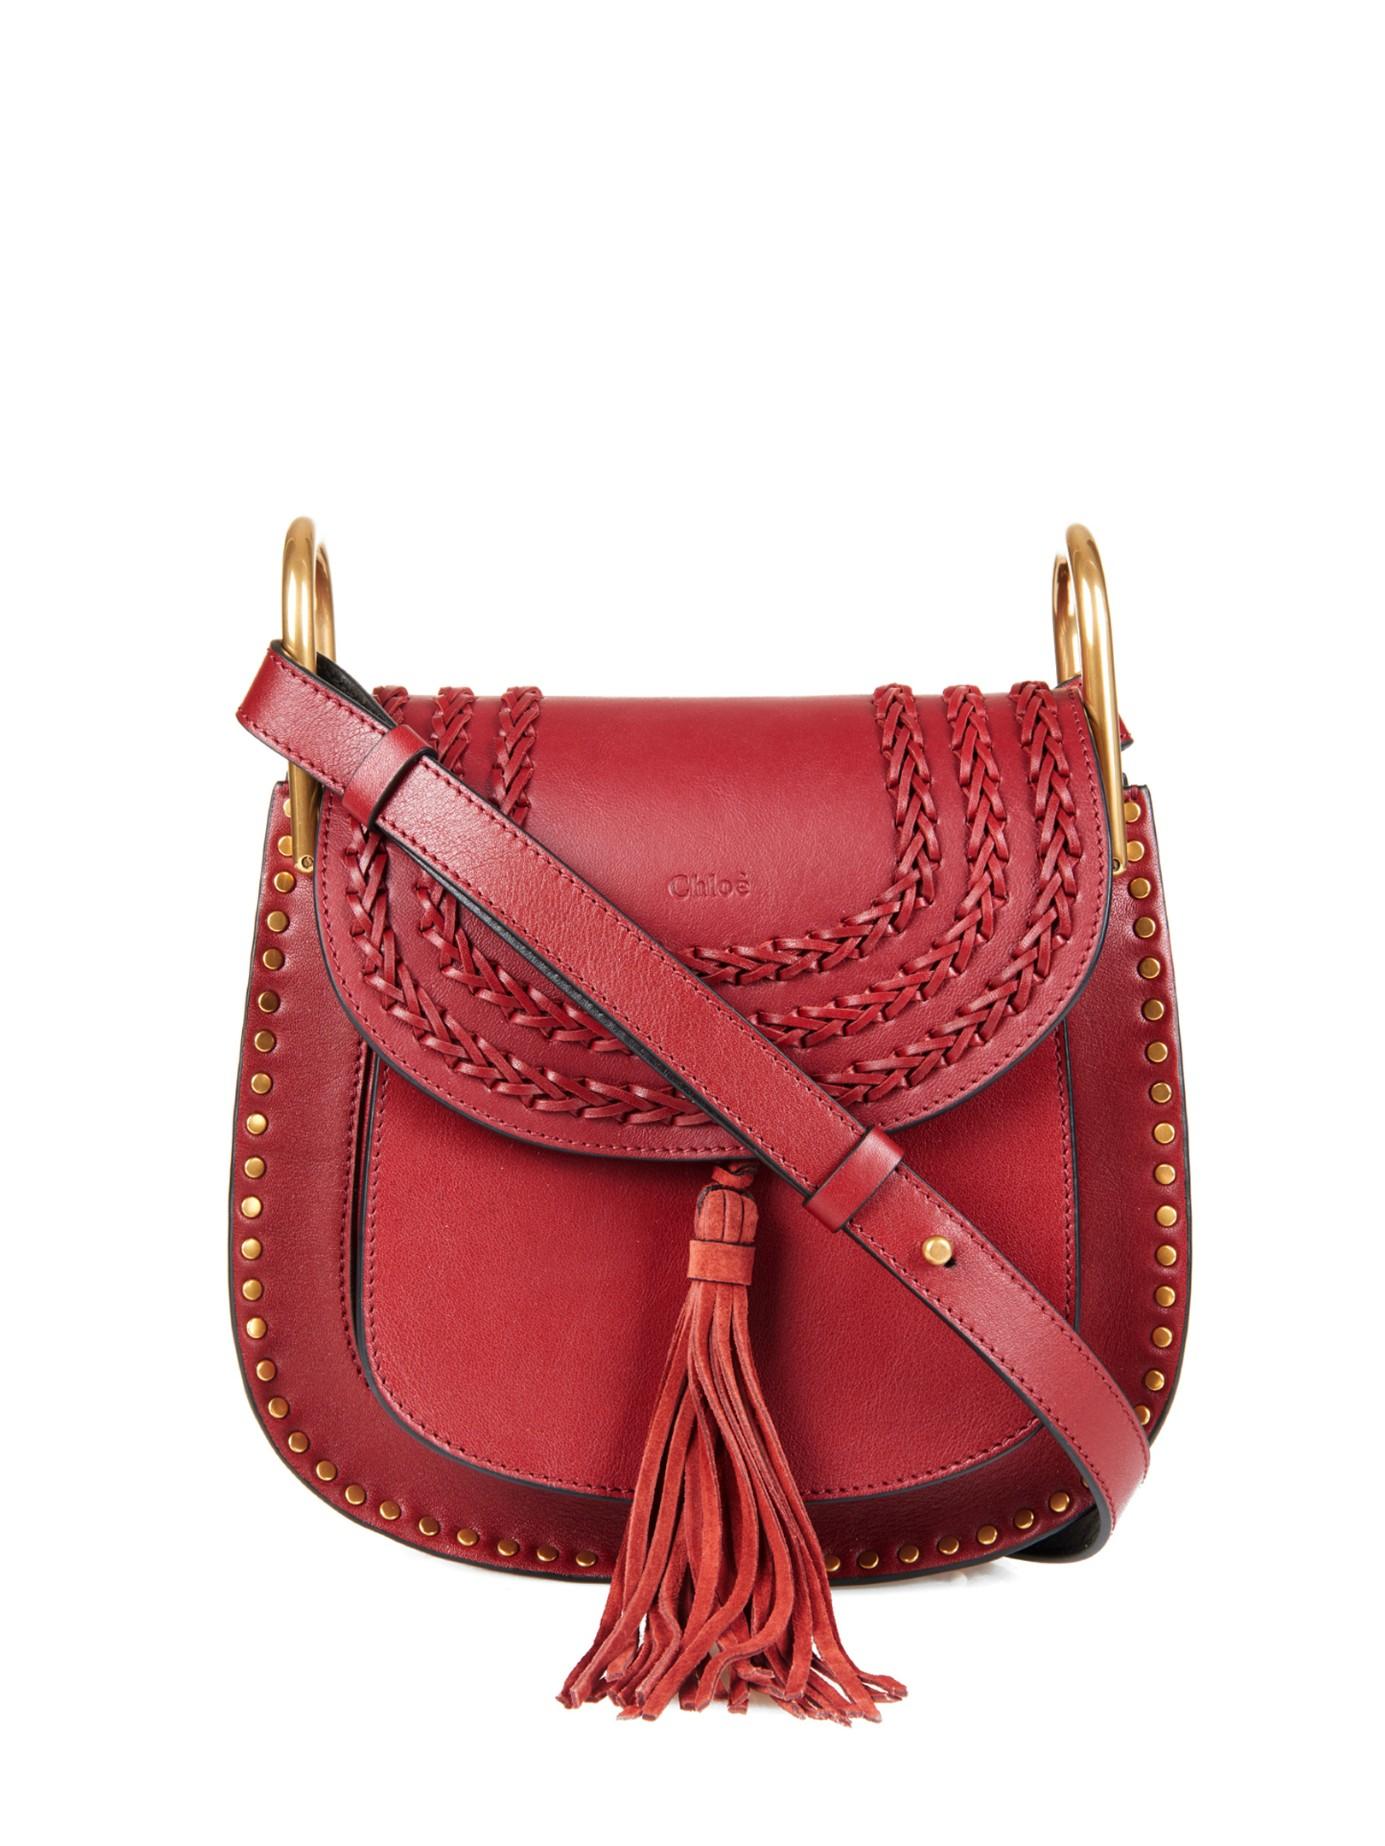 18b85b4c Chloé Red Hudson Small Leather Shoulder Bag